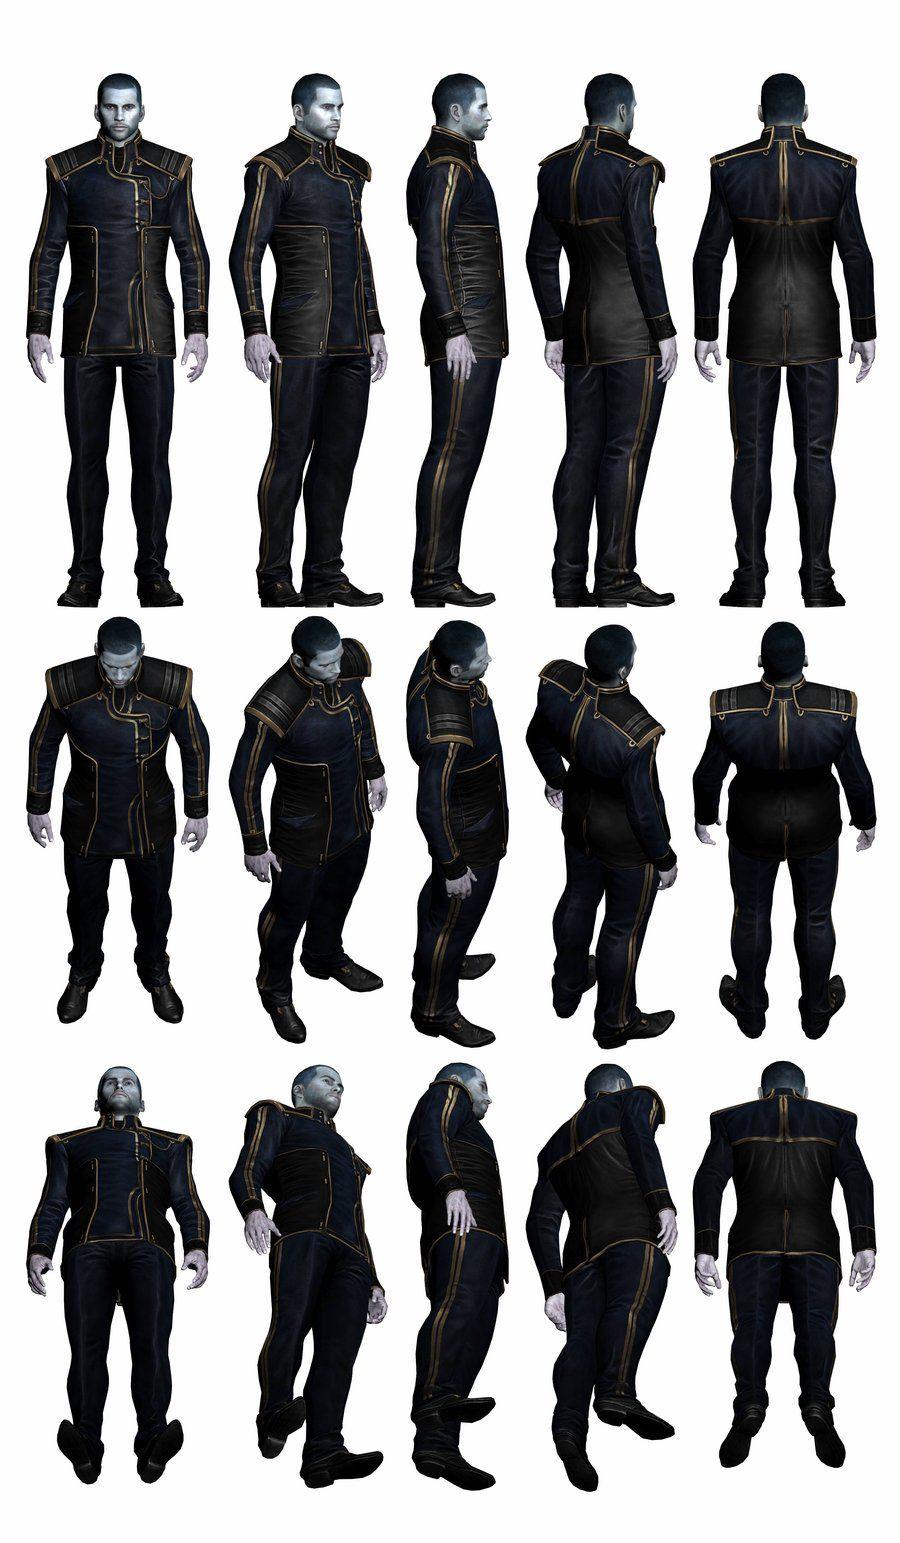 Mass Effect Alliance Soldier